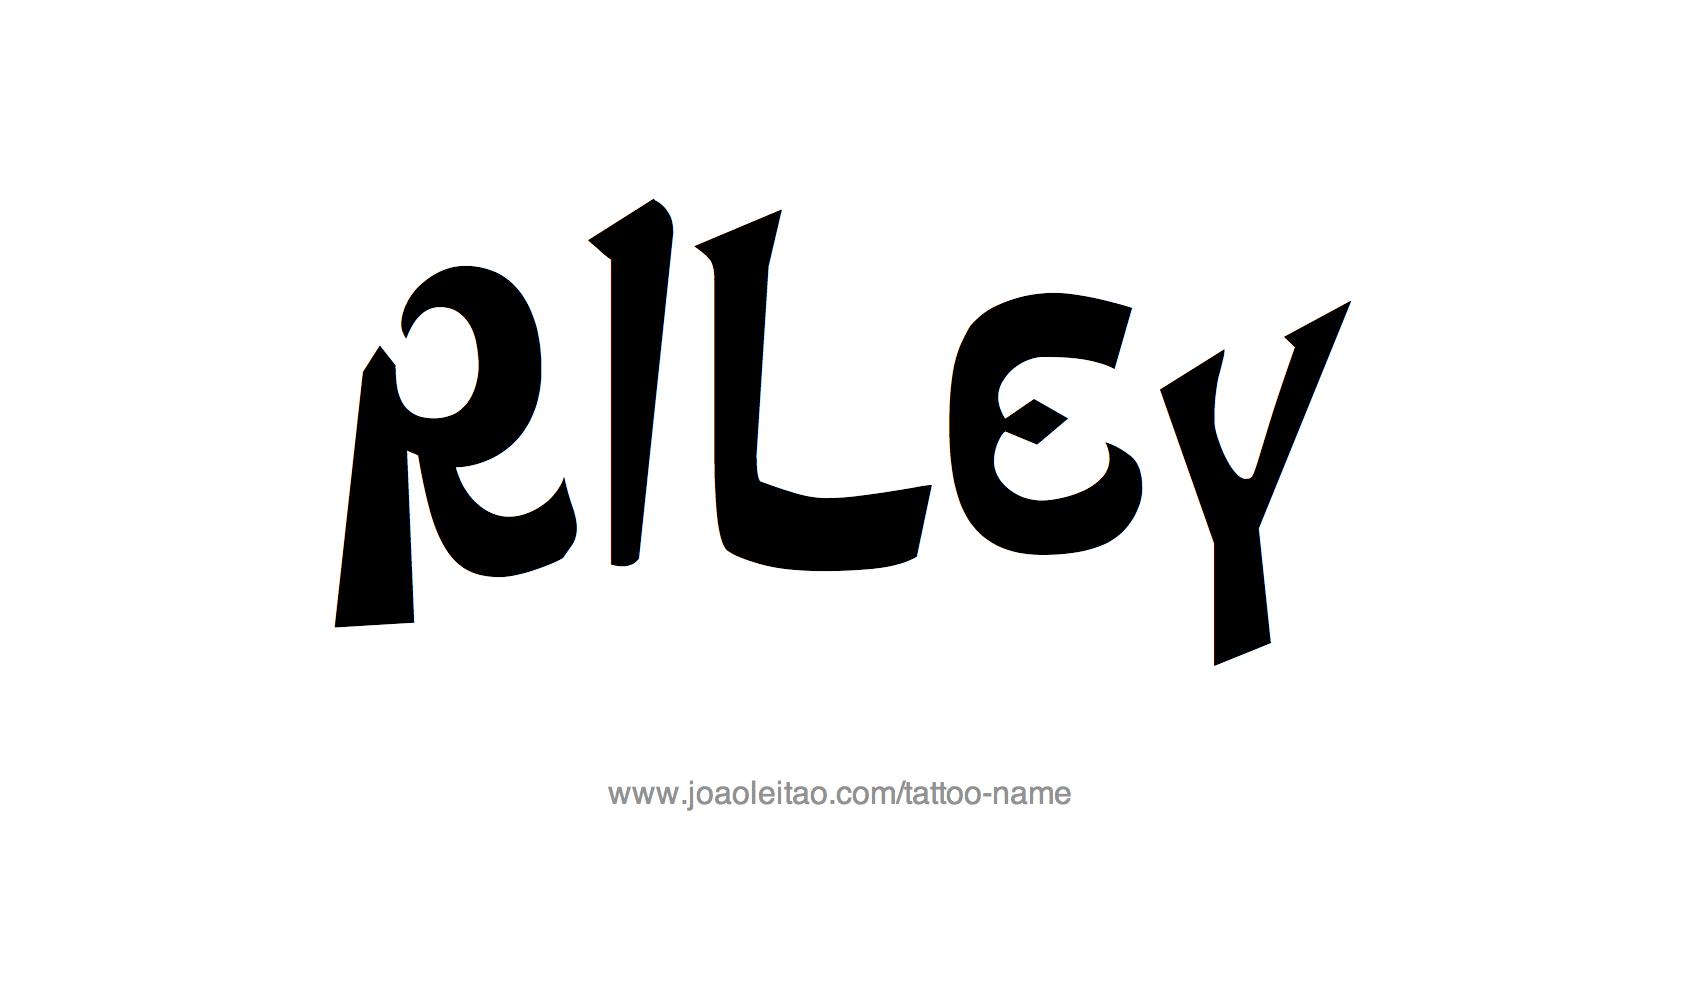 Name: Riley Name Tattoo Designs